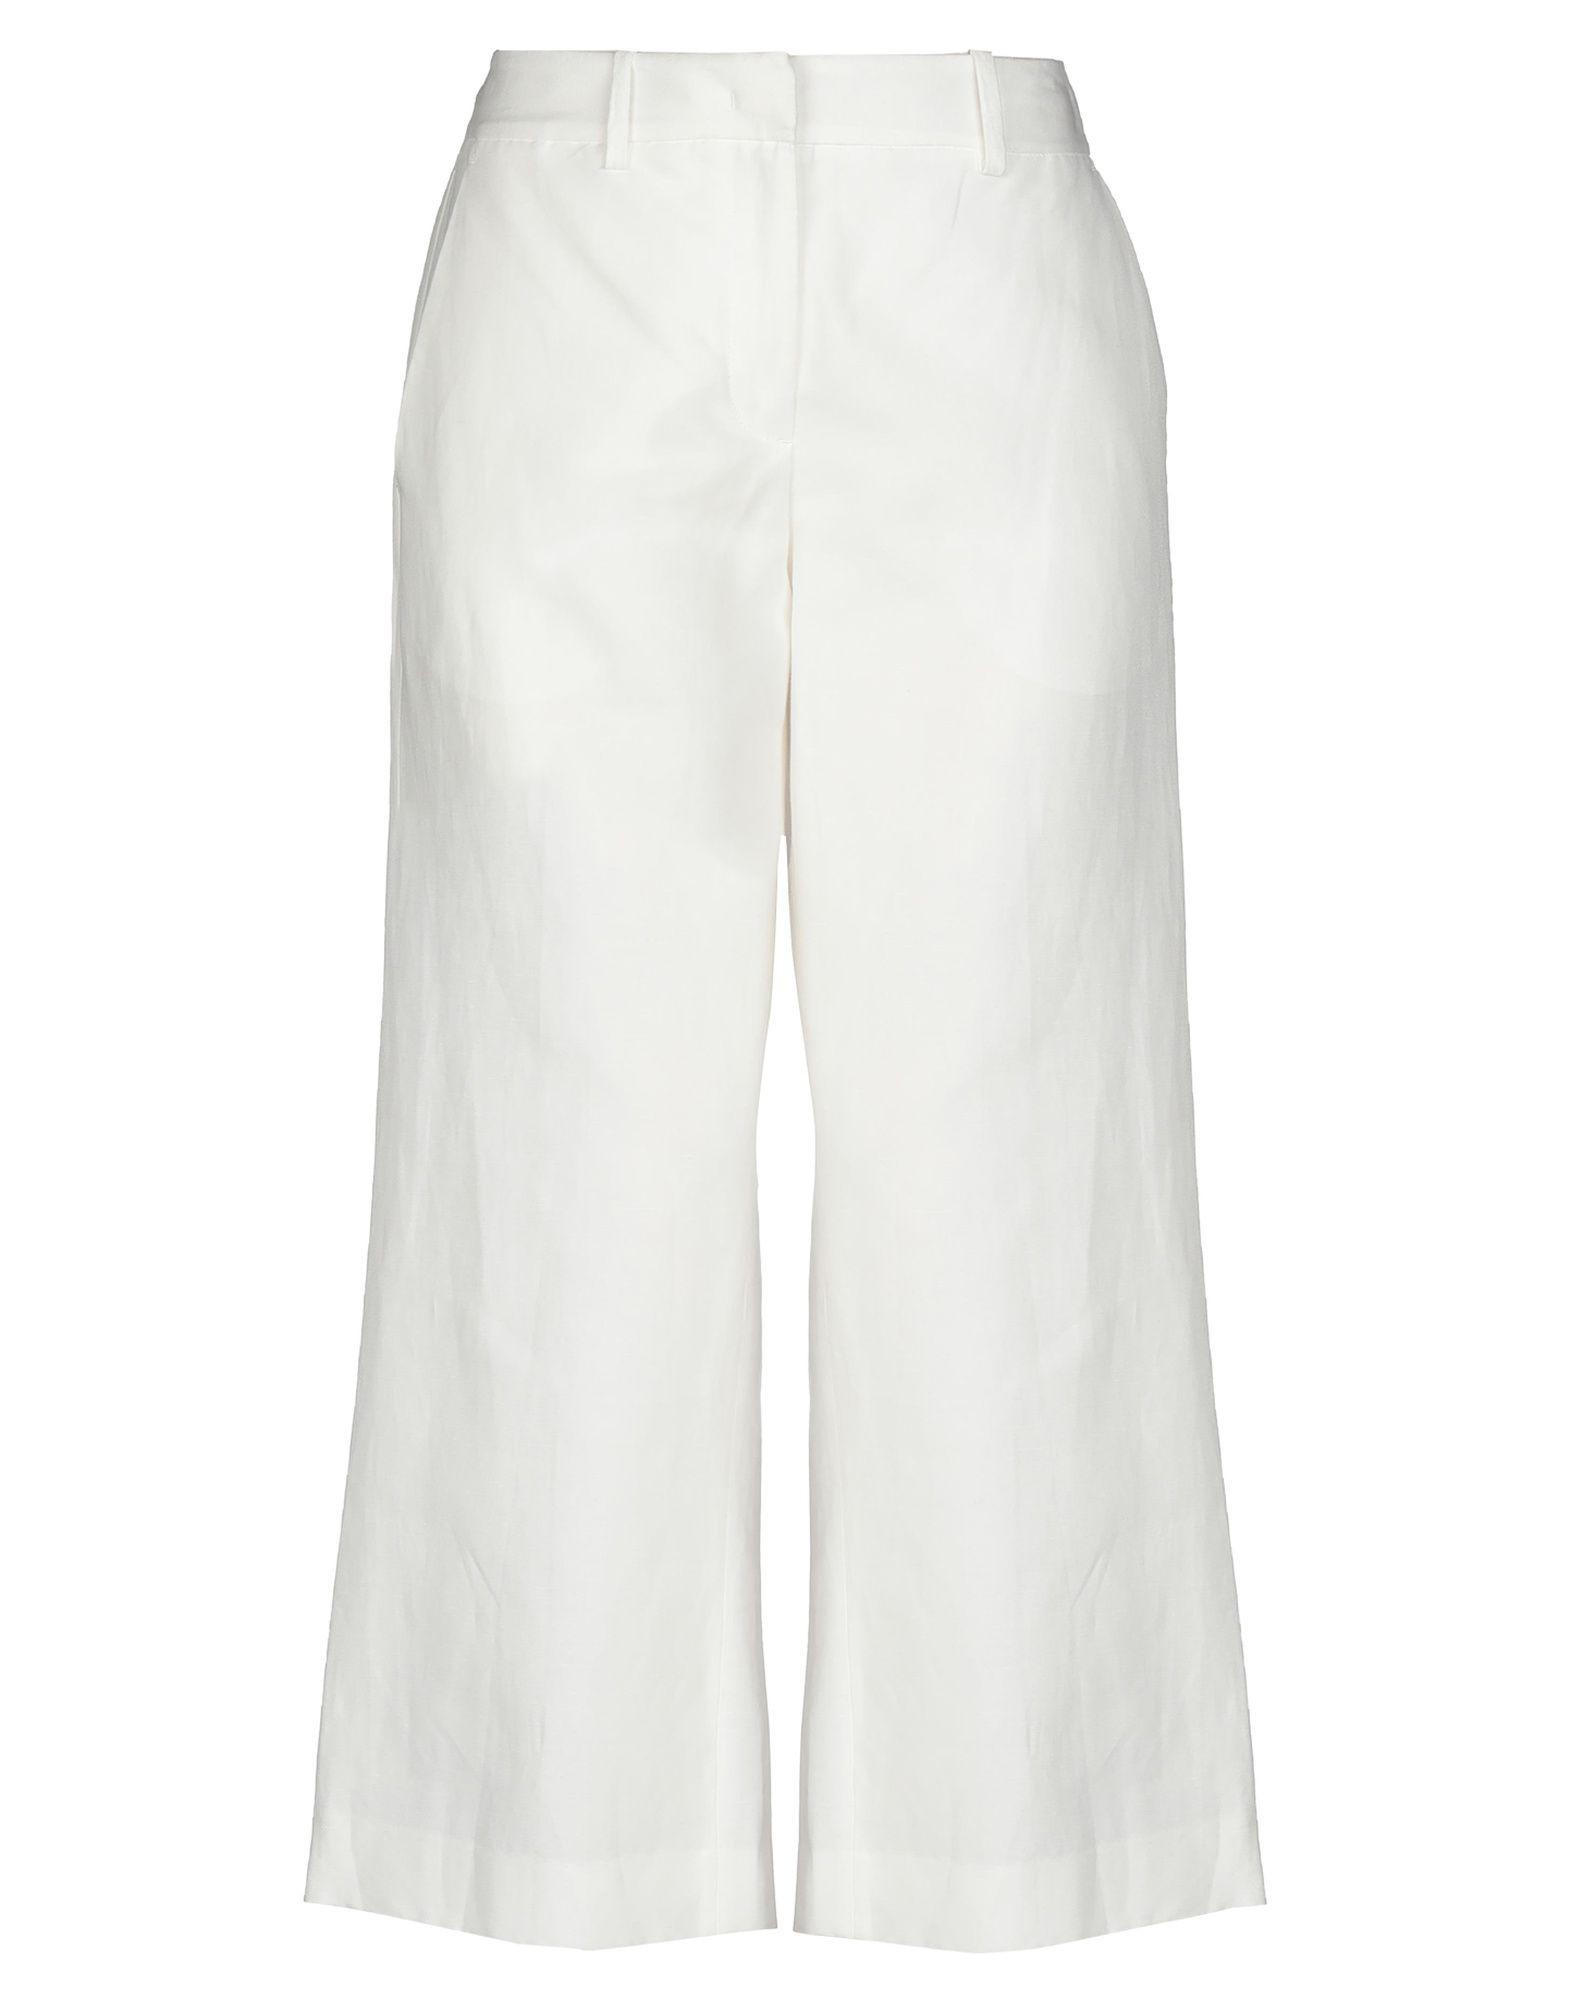 Fashion Shop - ARMANI JEANS 3/4-length shorts - Item 13133720